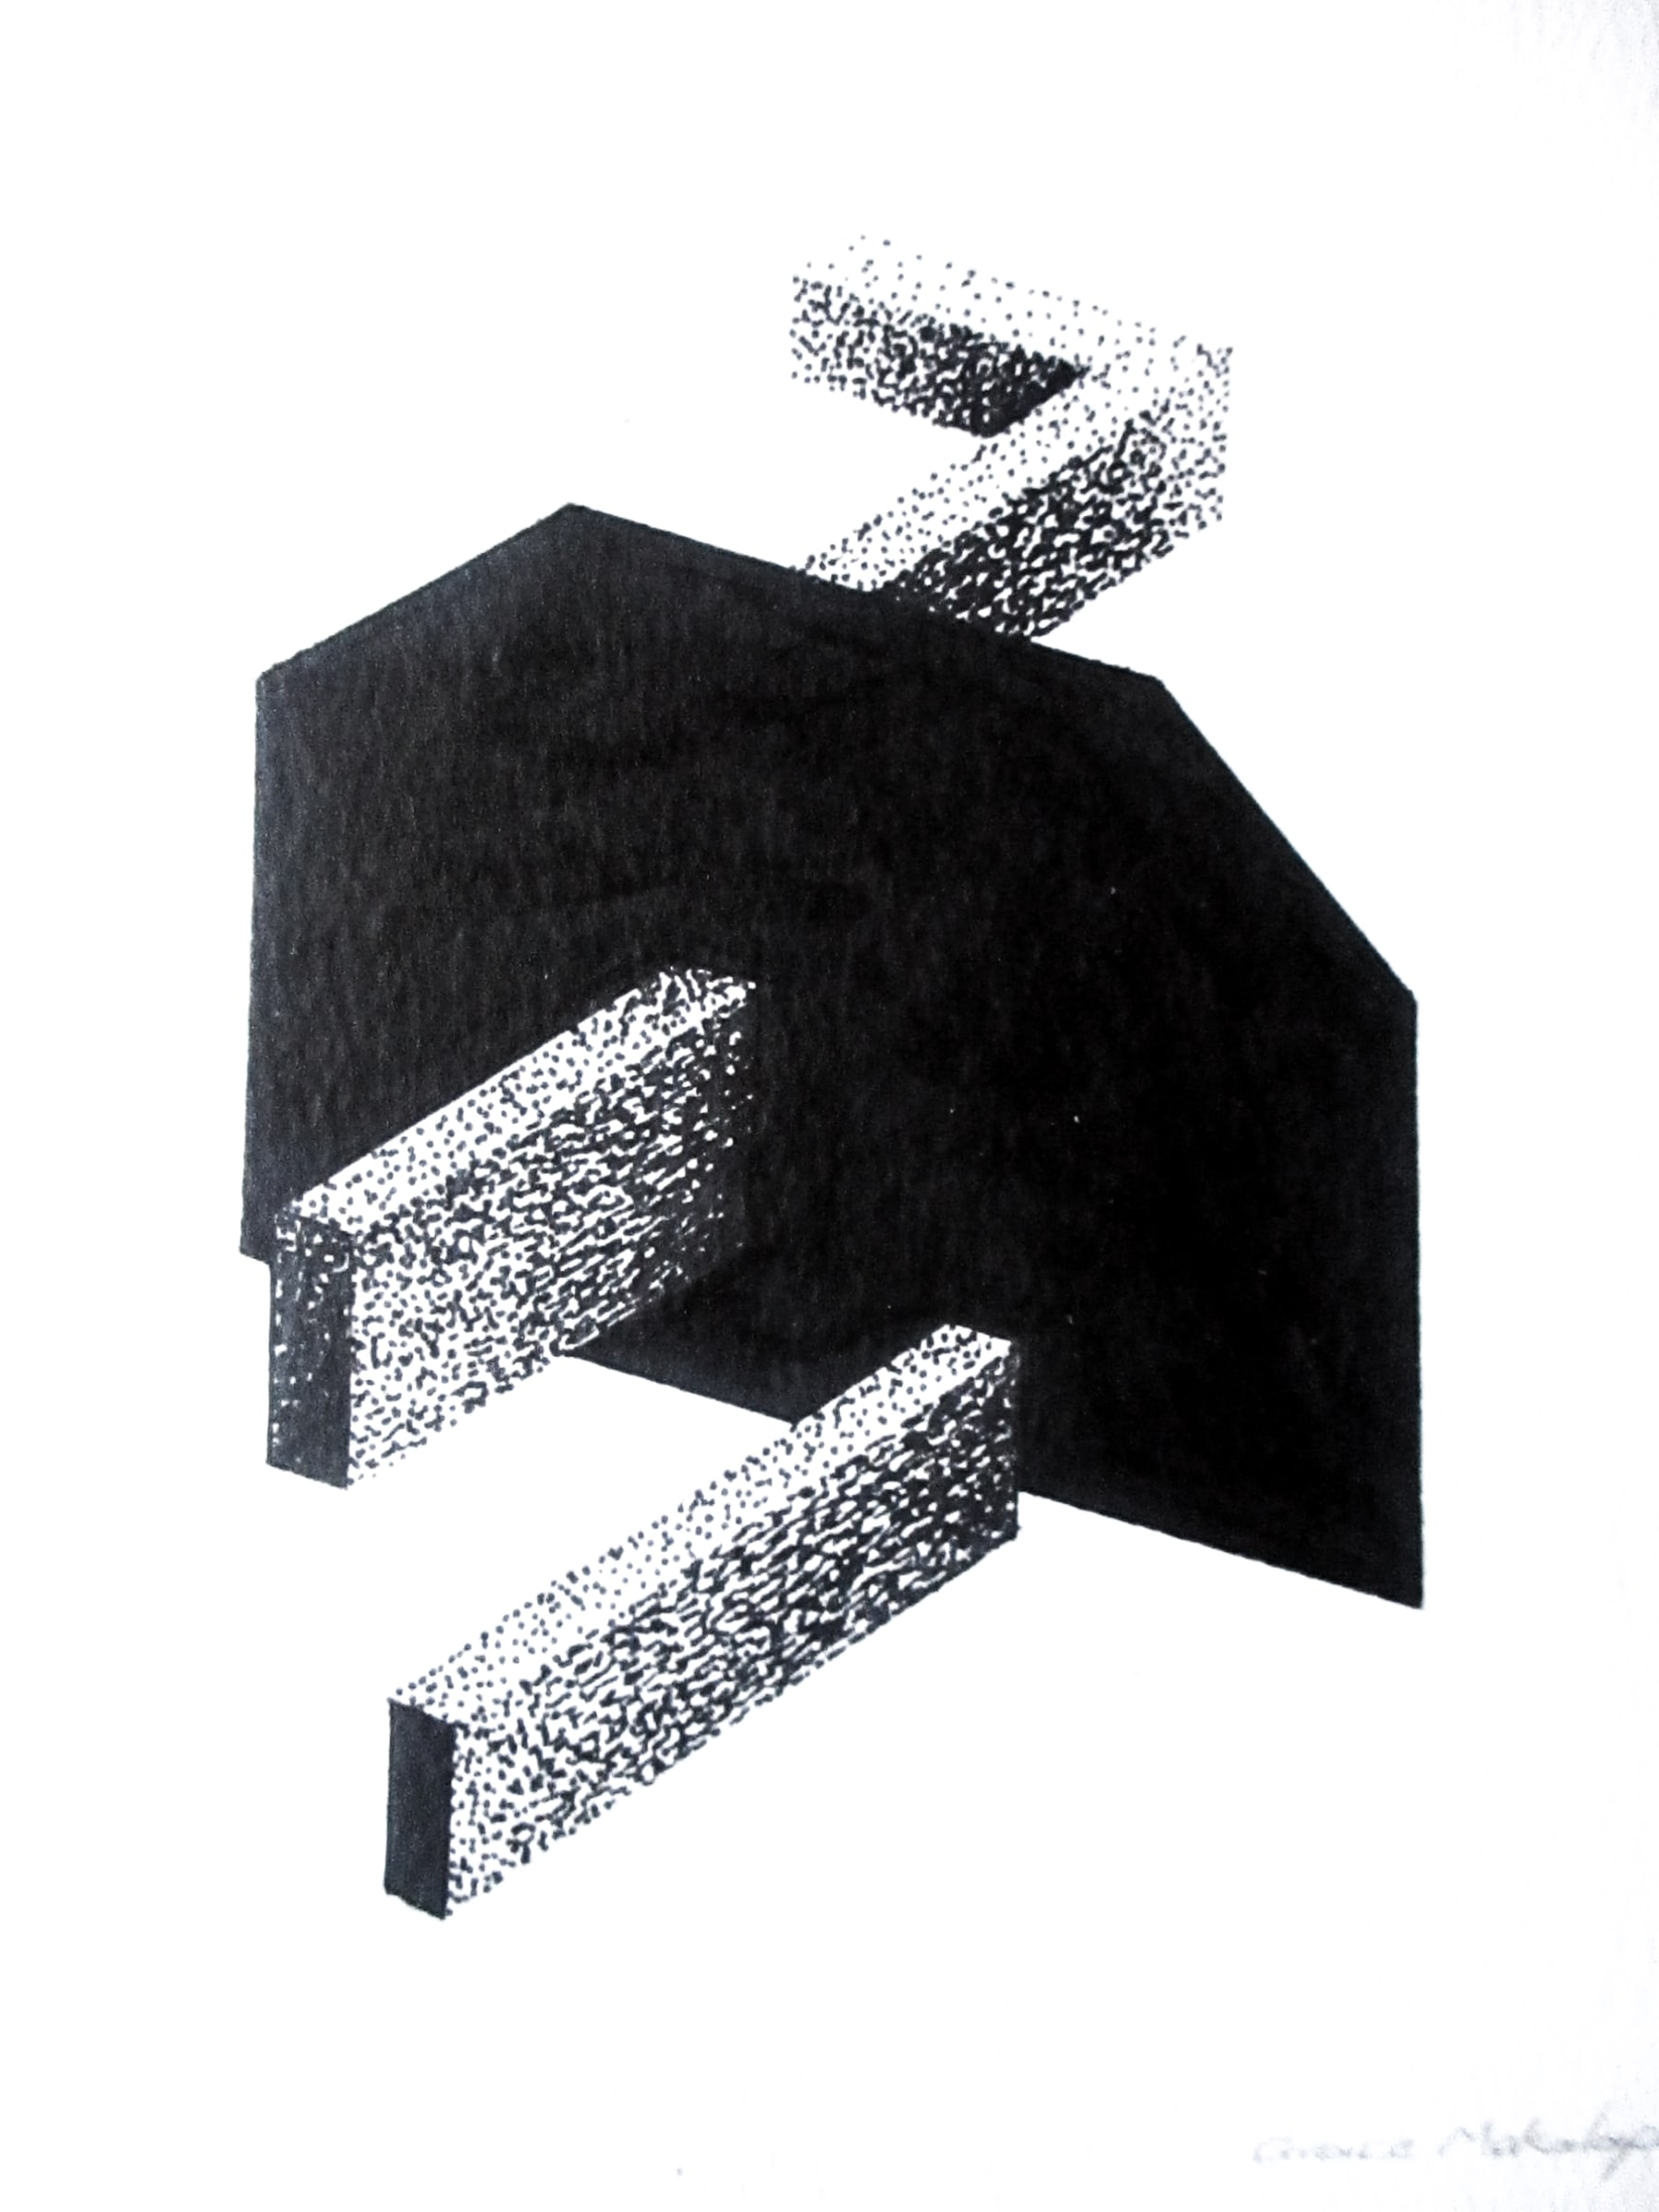 <span class=&#34;link fancybox-details-link&#34;><a href=&#34;/artists/90-mmabatho-grace-mokalapa/works/2310-mmabatho-grace-mokalapa-day-22-2018/&#34;>View Detail Page</a></span><div class=&#34;artist&#34;><strong>Mmabatho Grace Mokalapa</strong></div> <div class=&#34;title&#34;><em>Day 22</em>, 2018</div> <div class=&#34;medium&#34;>Ink On Watercolour Paper</div> <div class=&#34;dimensions&#34;>21cm x 14.8cm</div><div class=&#34;price&#34;>R480.00</div>